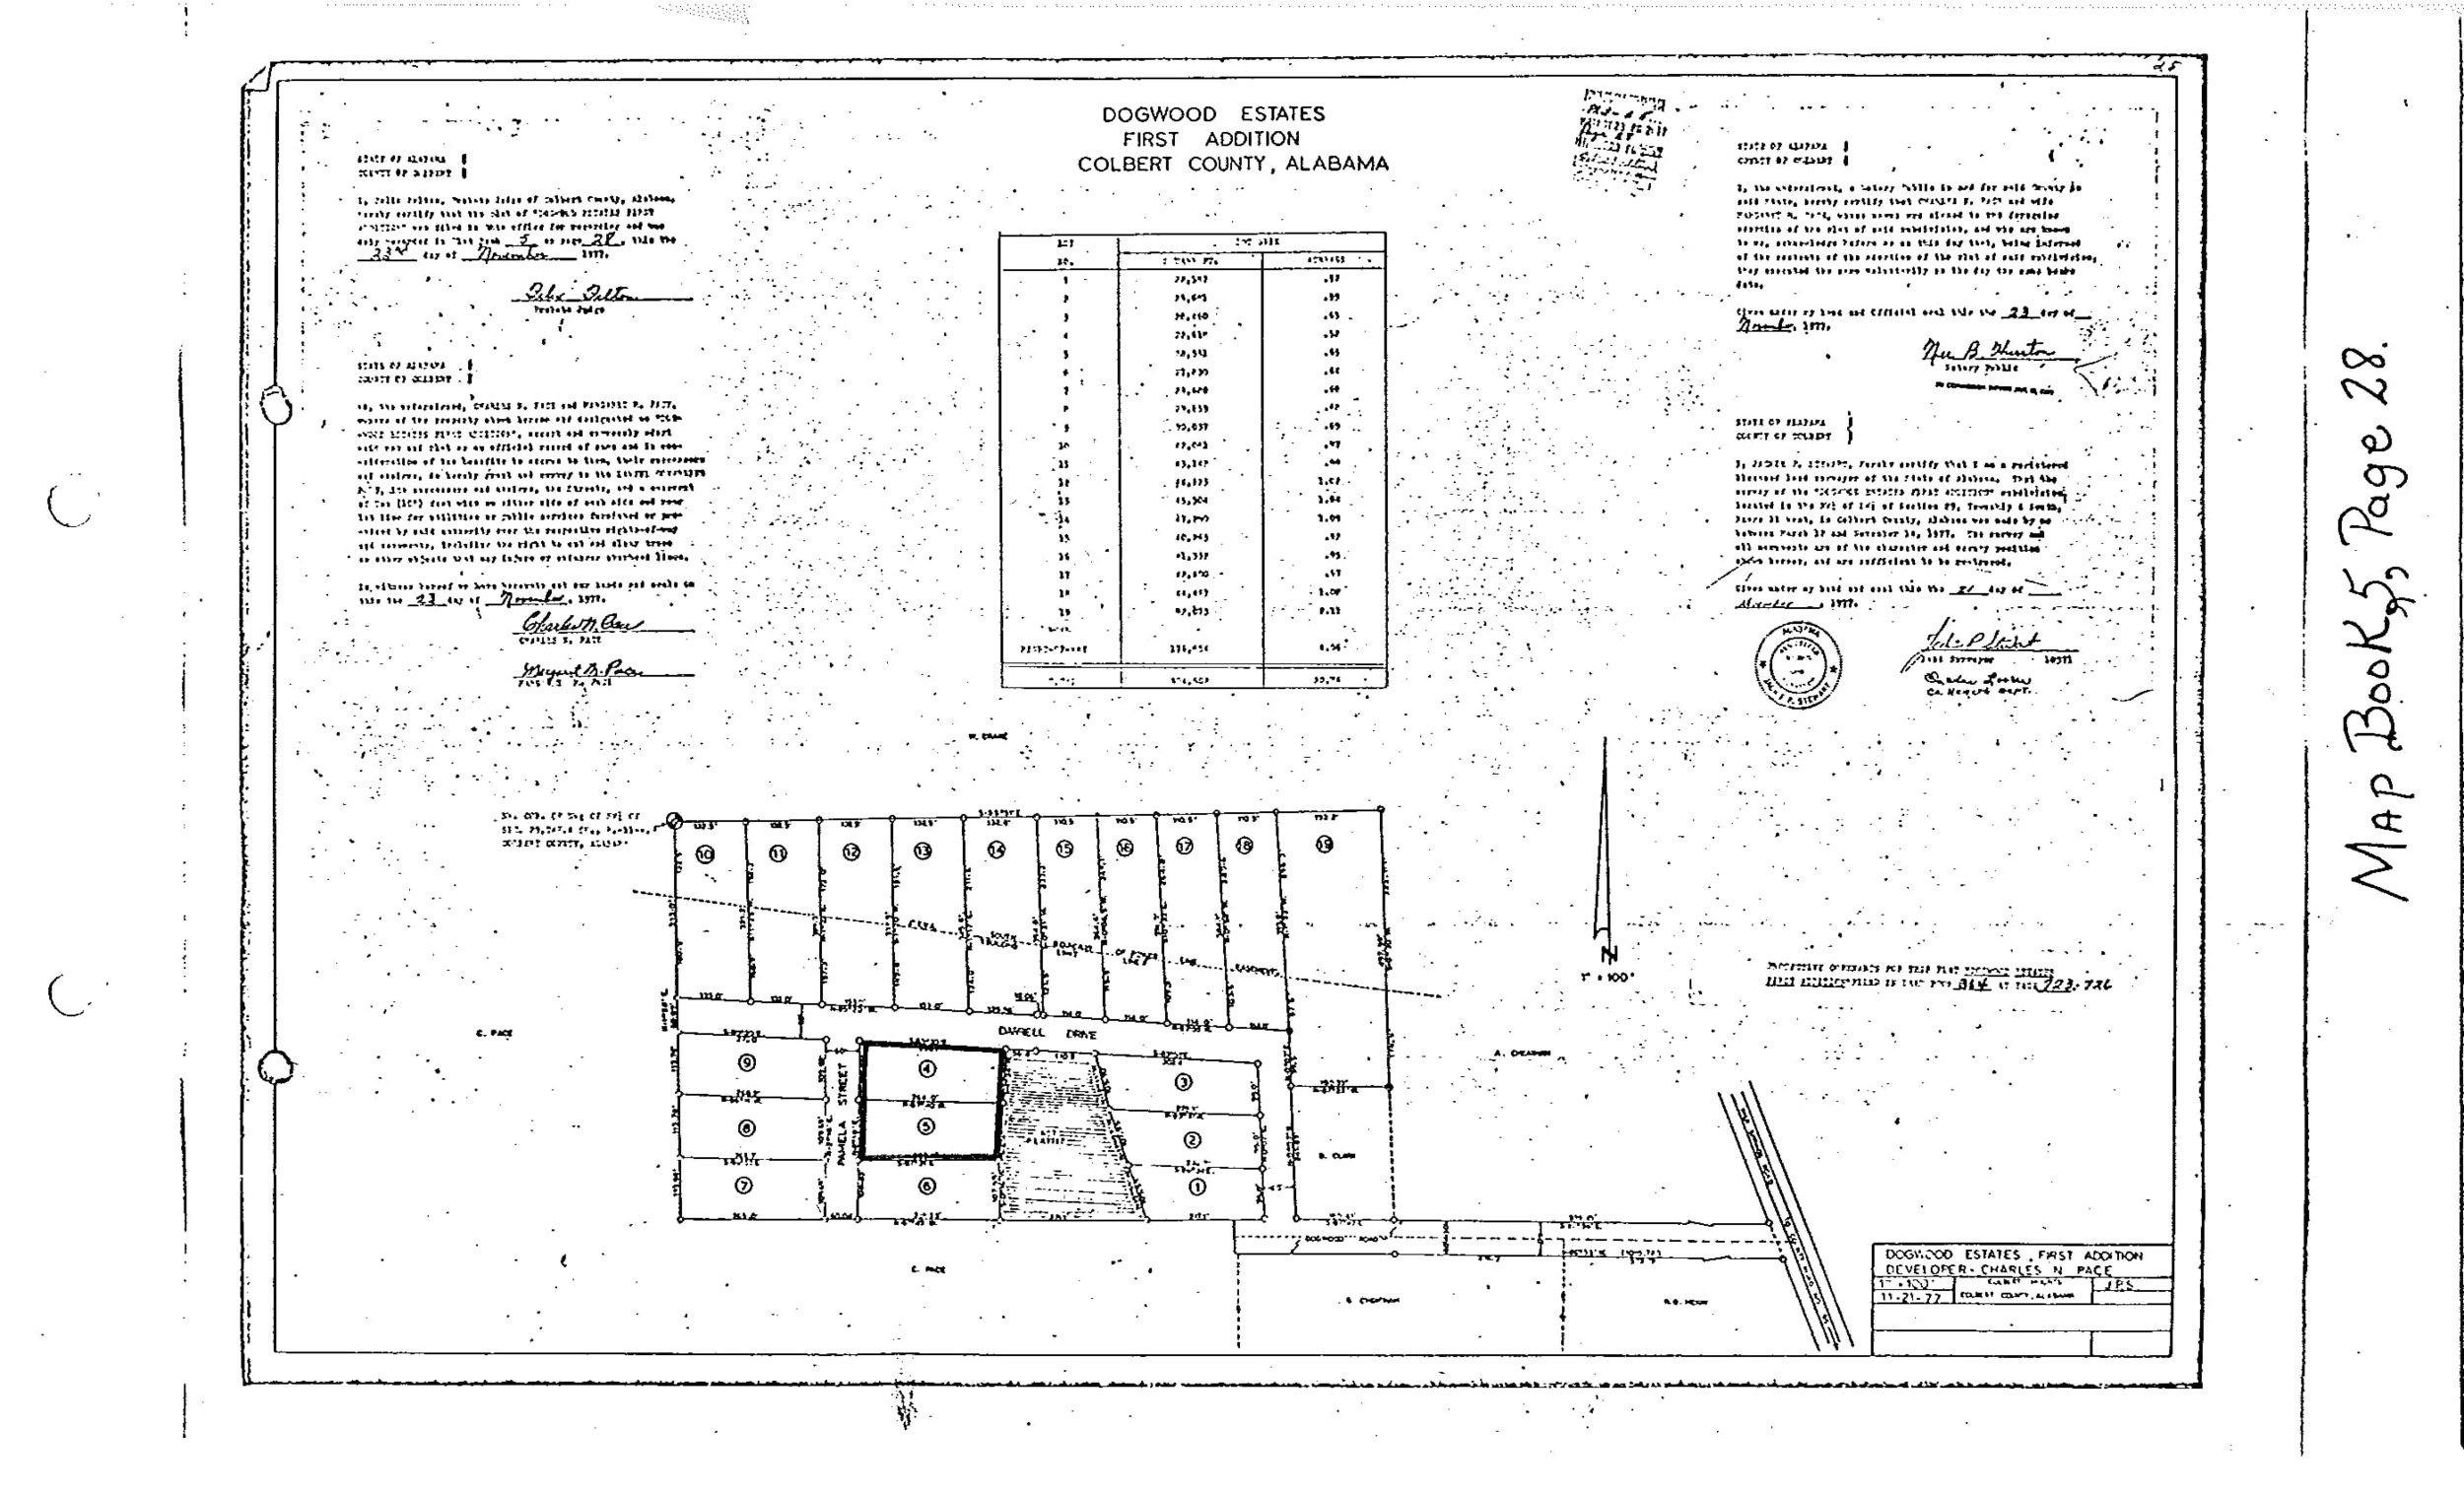 Plat-Dogwood-Estates-Addition-1-1.jpg